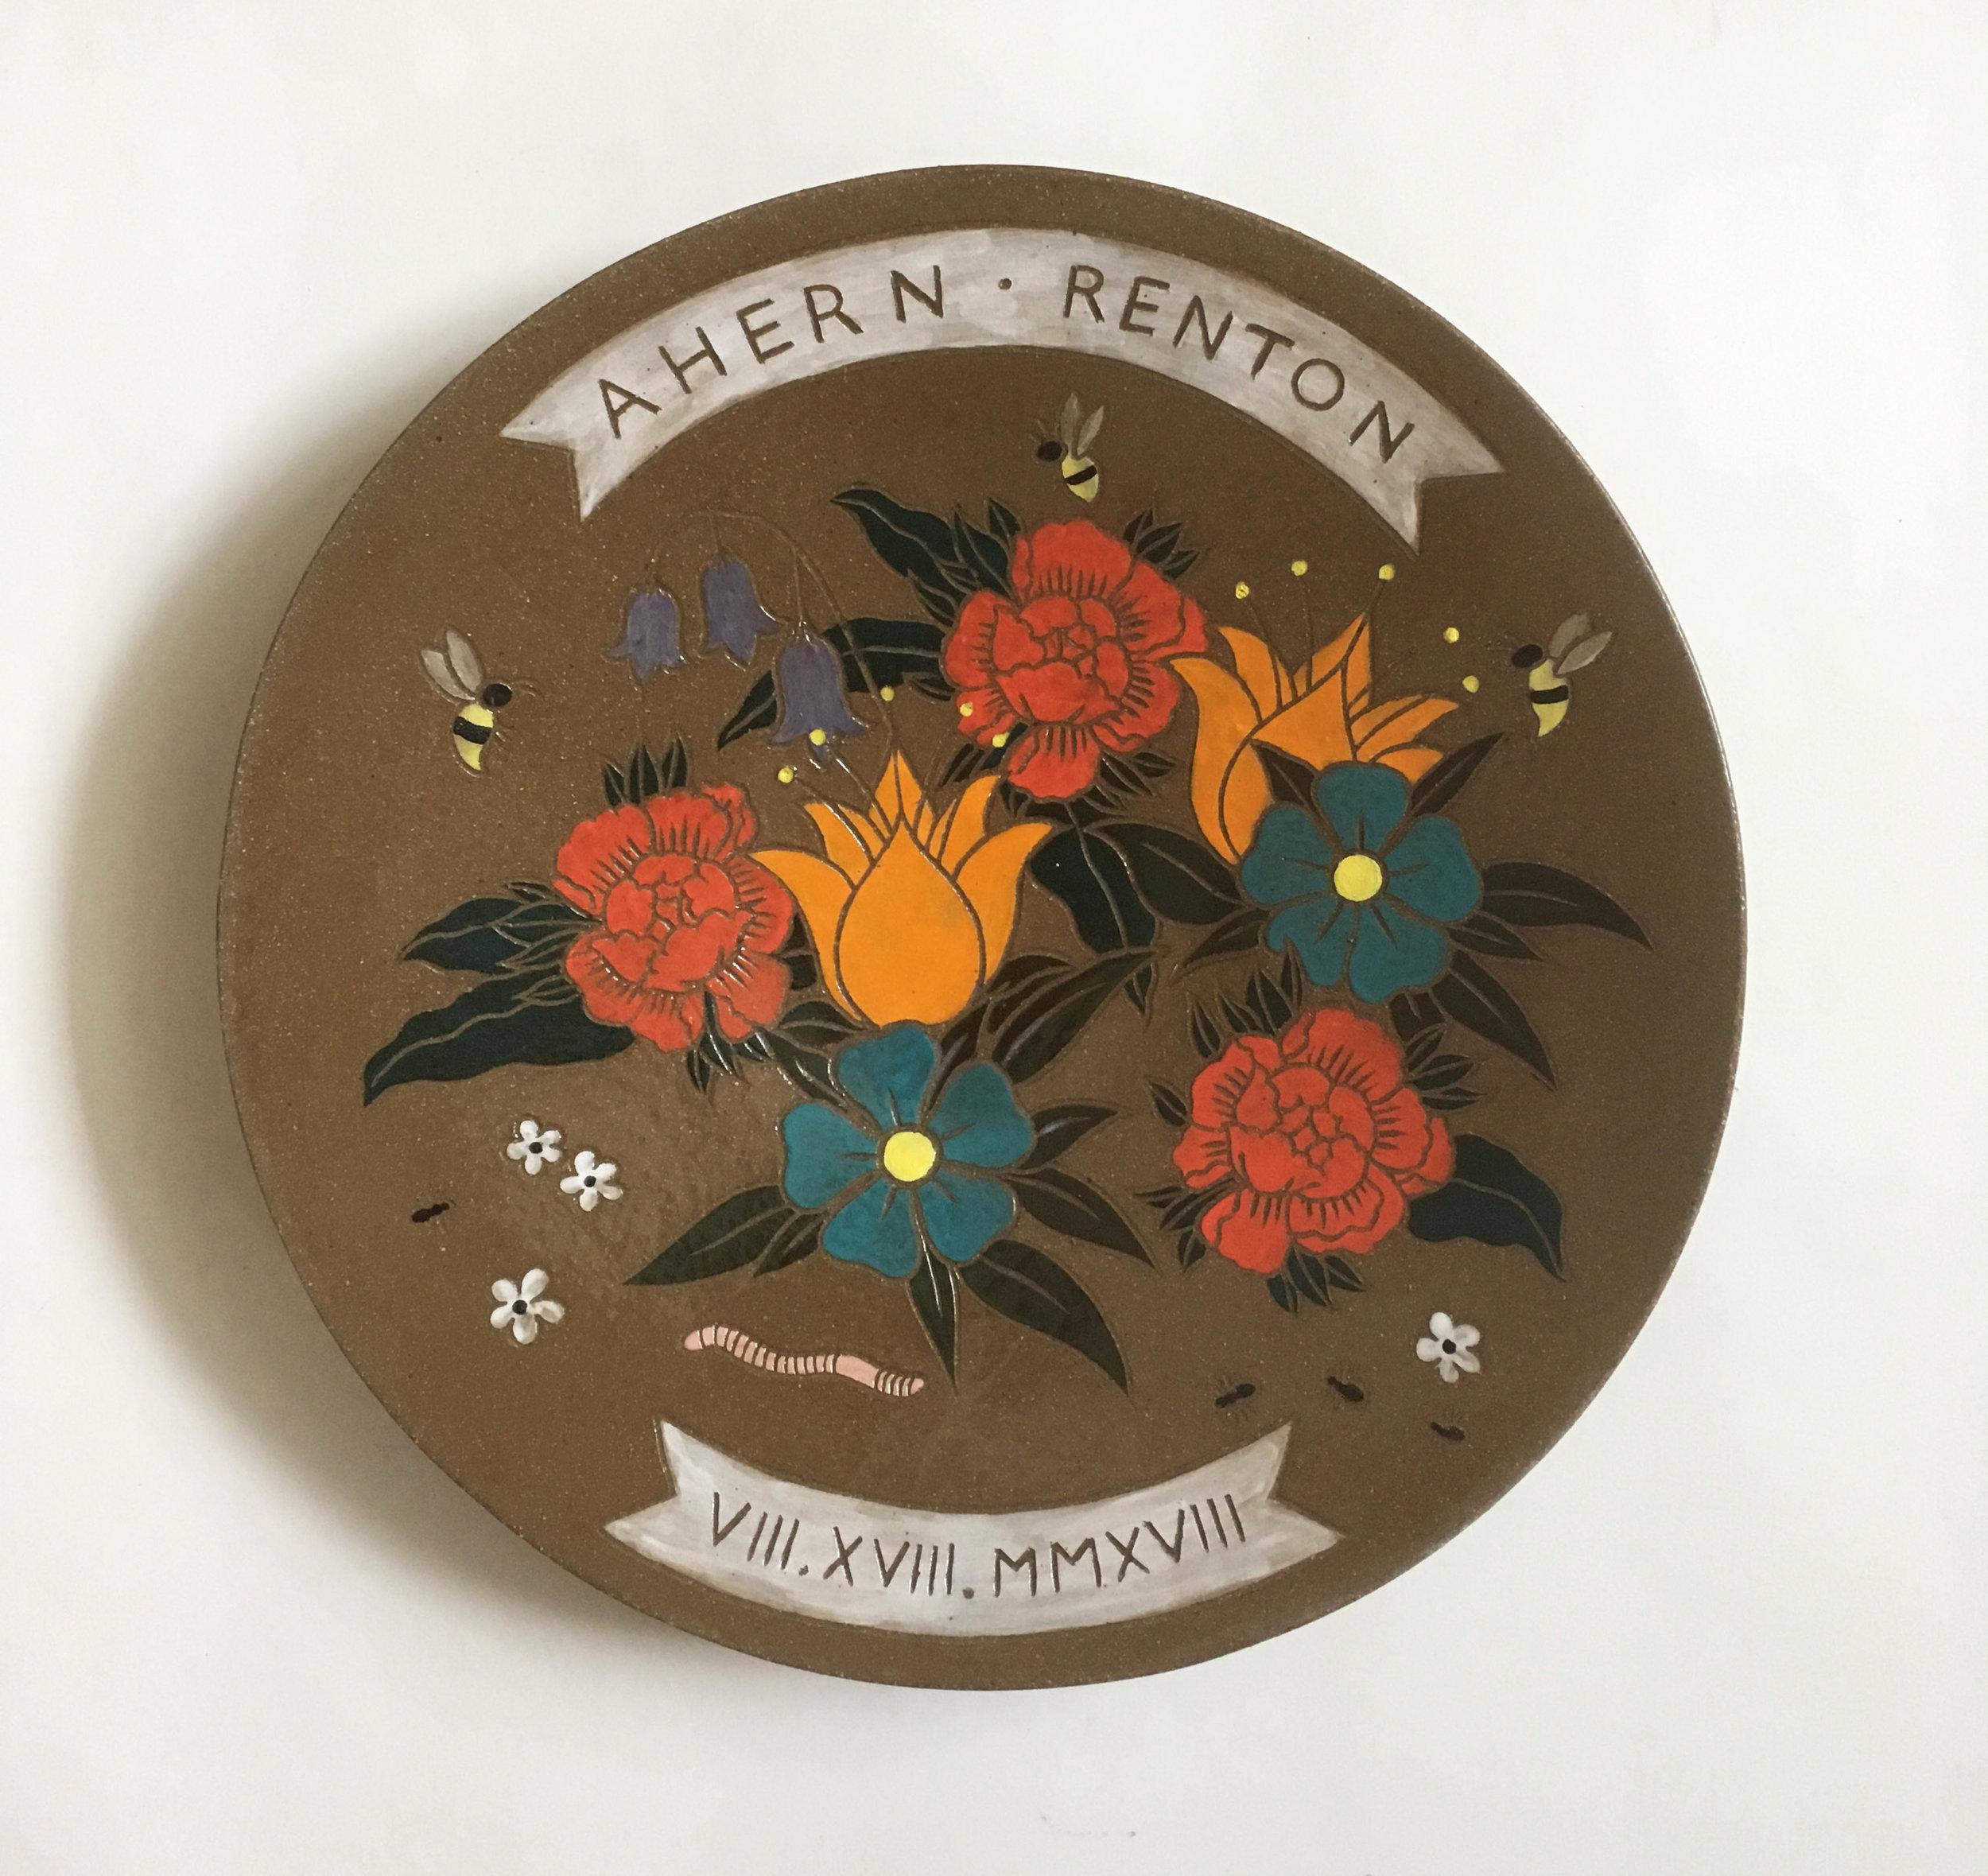 Ahern - Renton platter